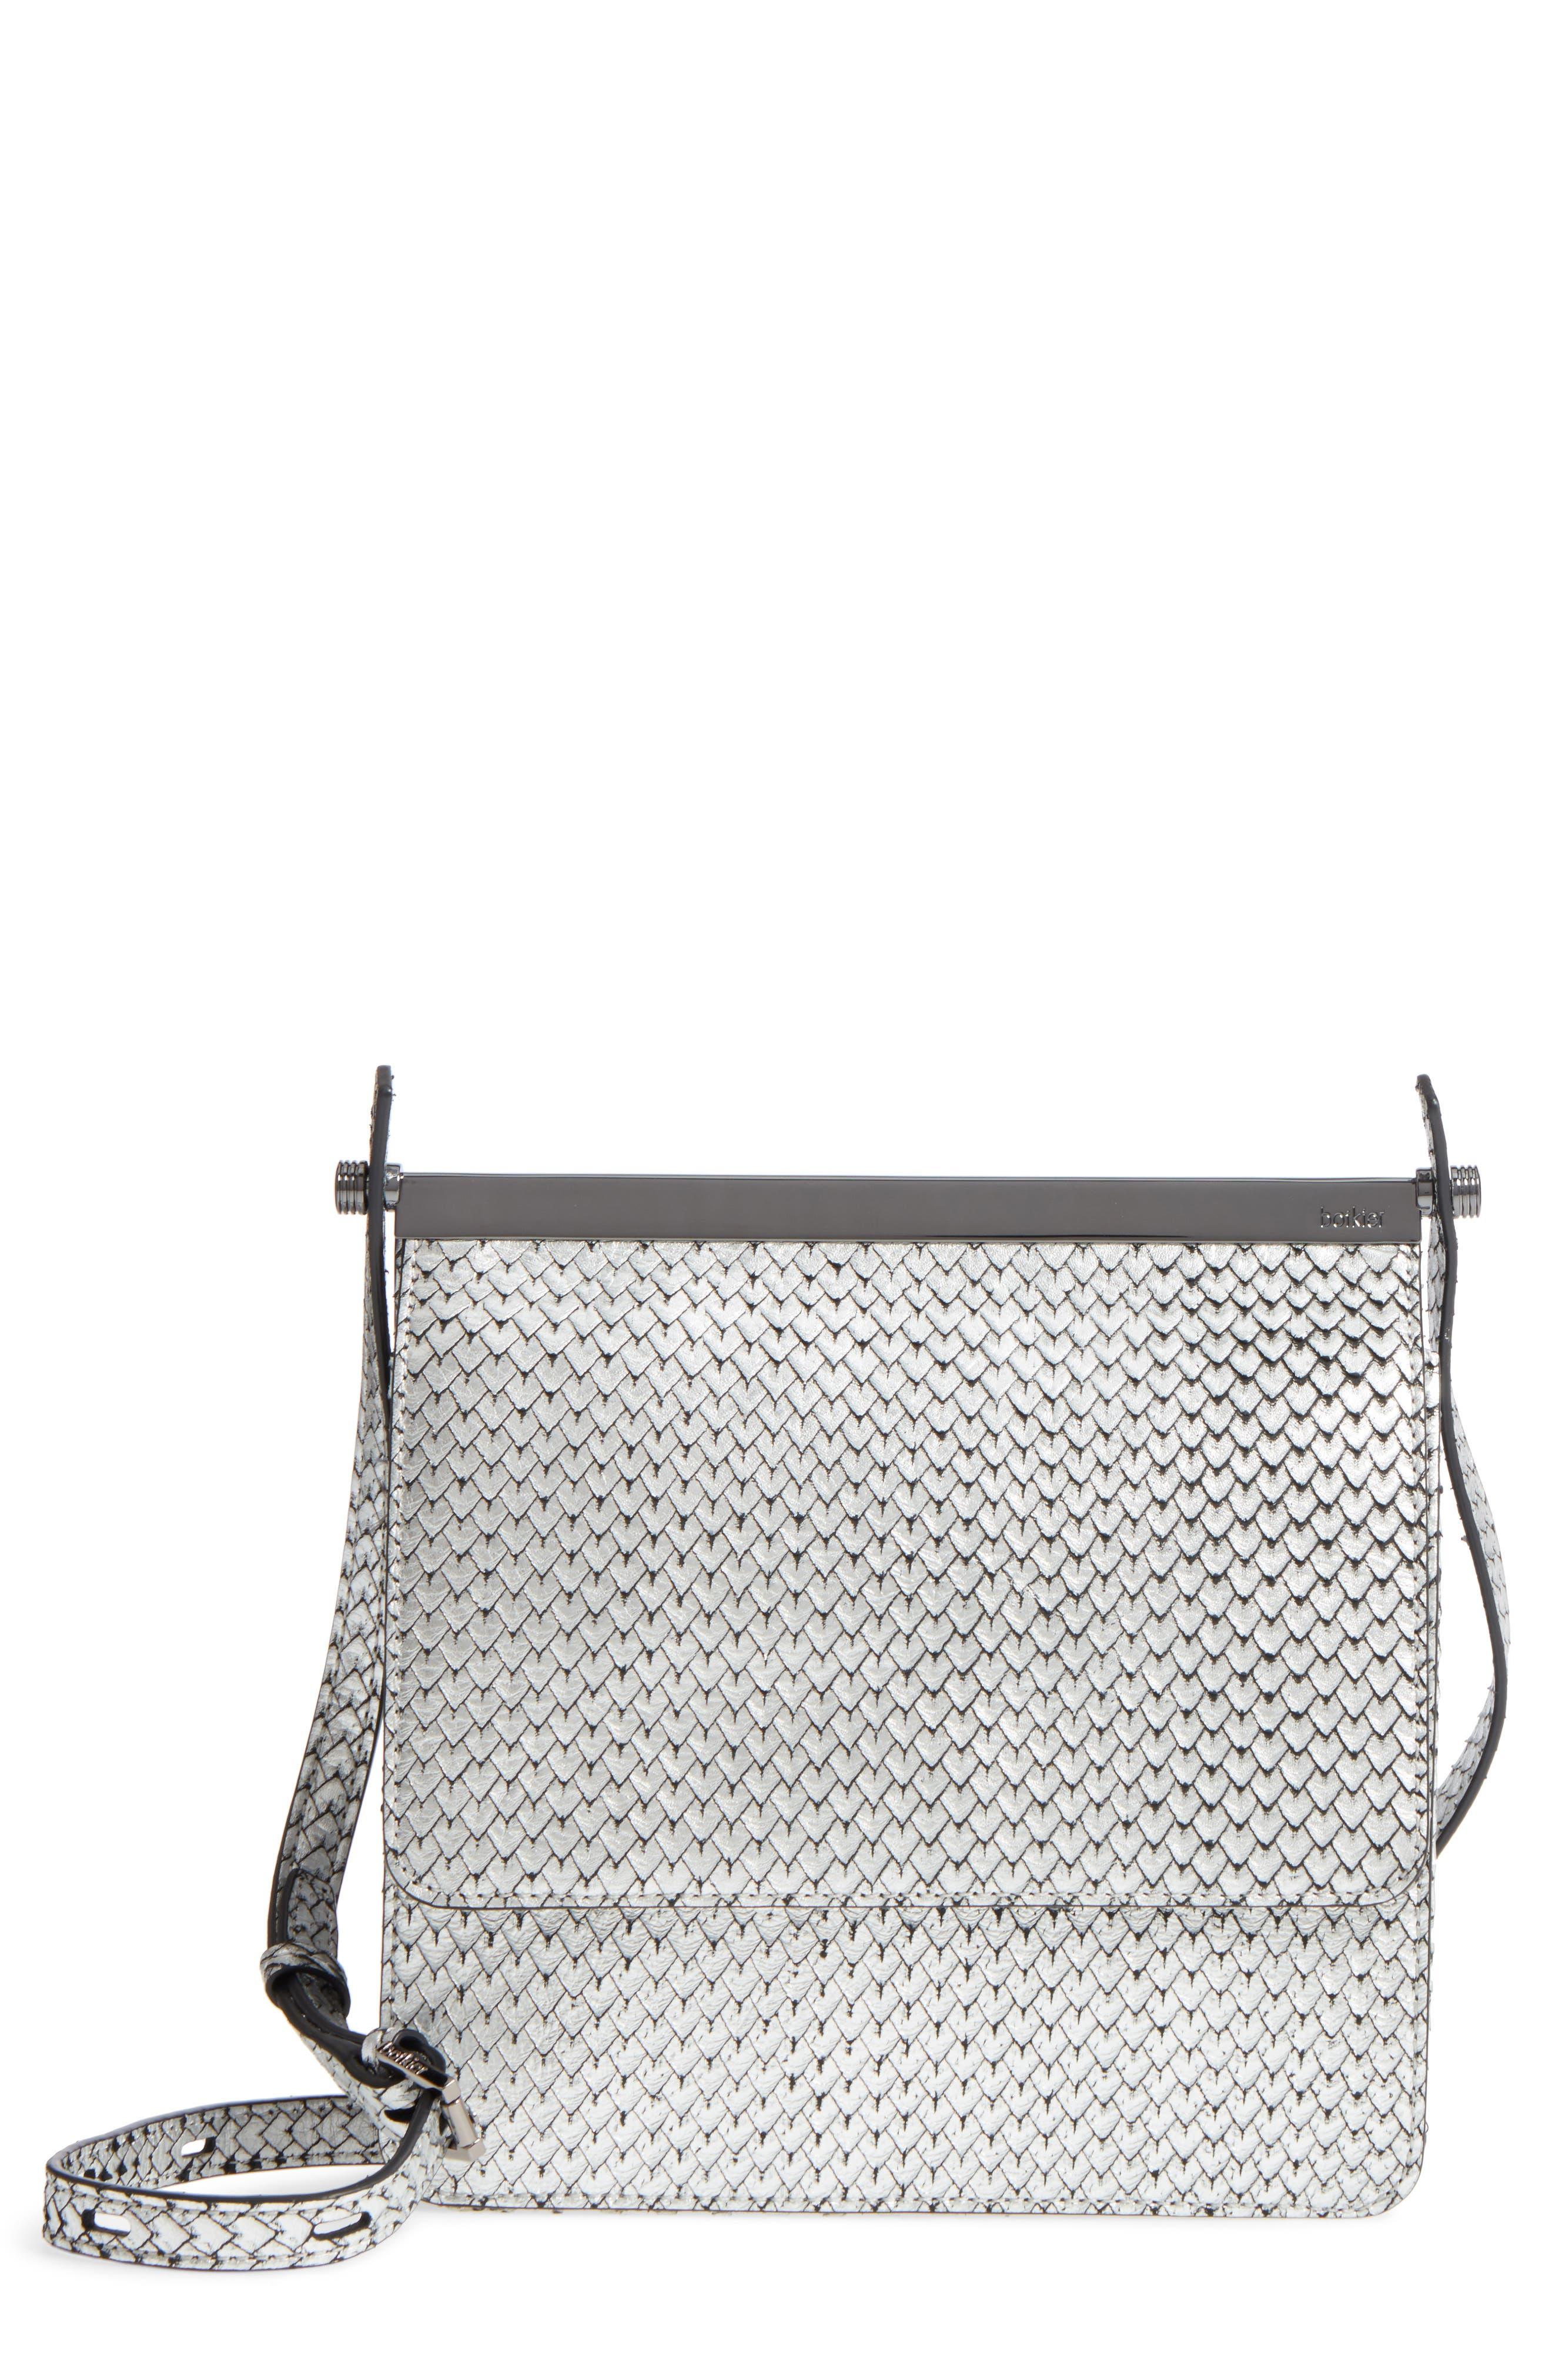 Botkier Crawford Calfskin Leather Crossbody Bag